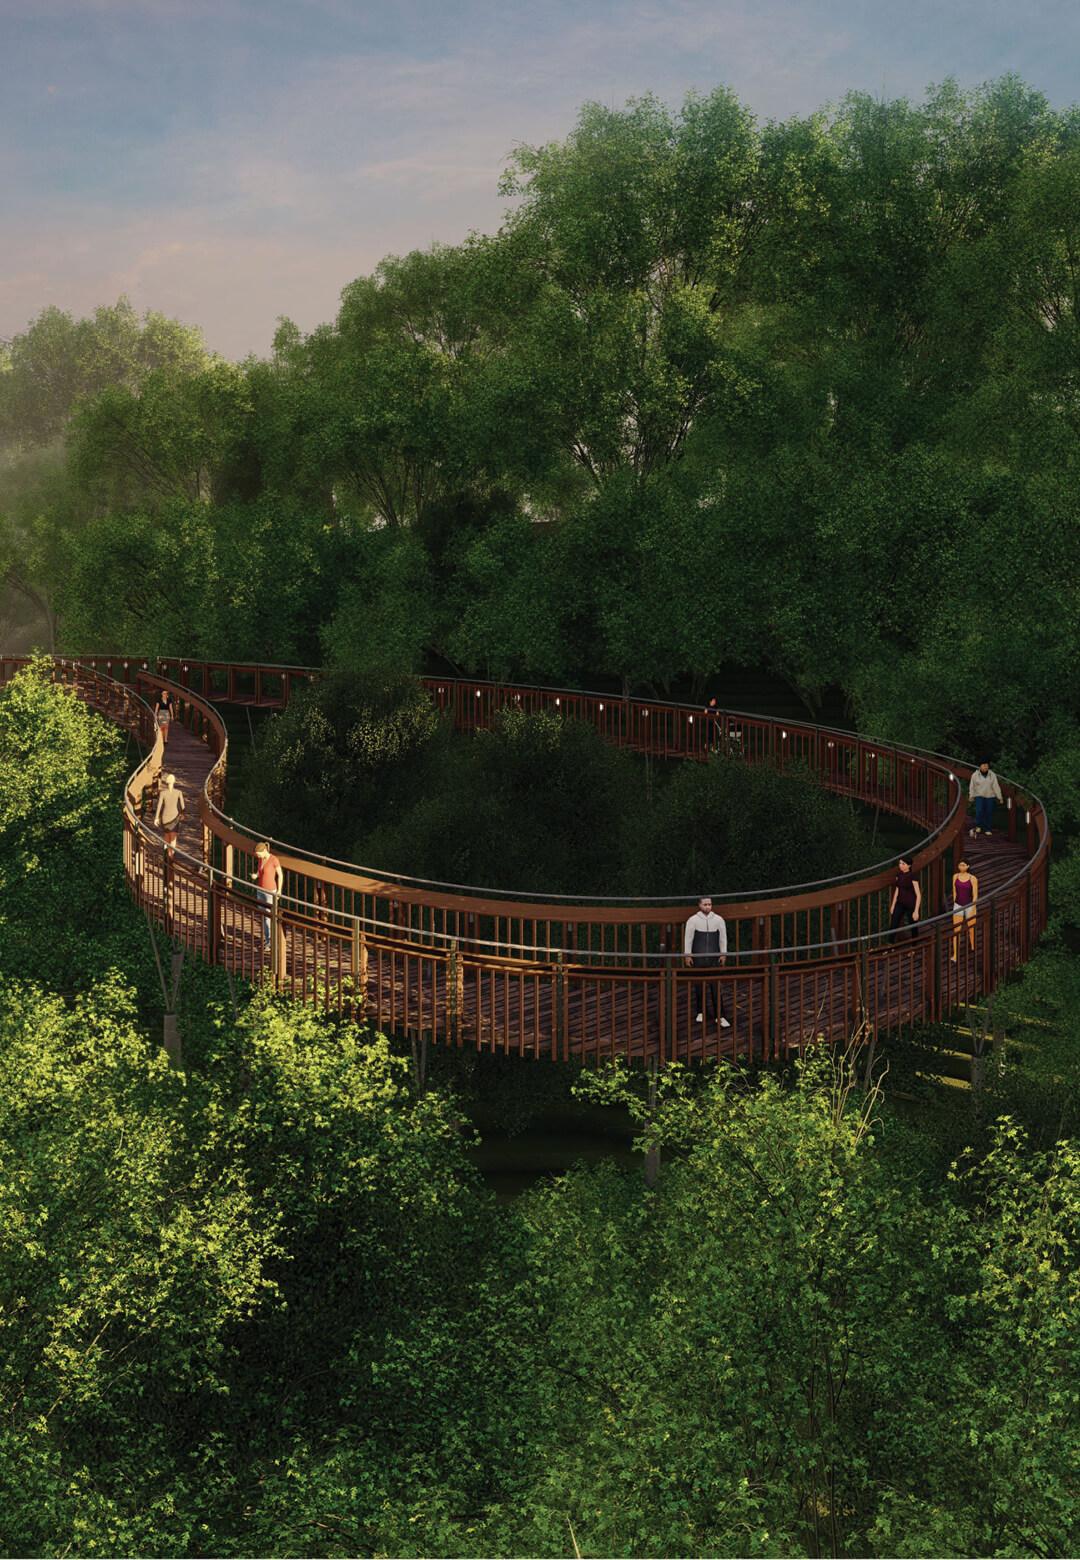 IMK Architects imagine Malabar Hill Forest Trail for the city of Mumbai in India | Malabar Hill Forest Trail by IMK Architects | STIRworld